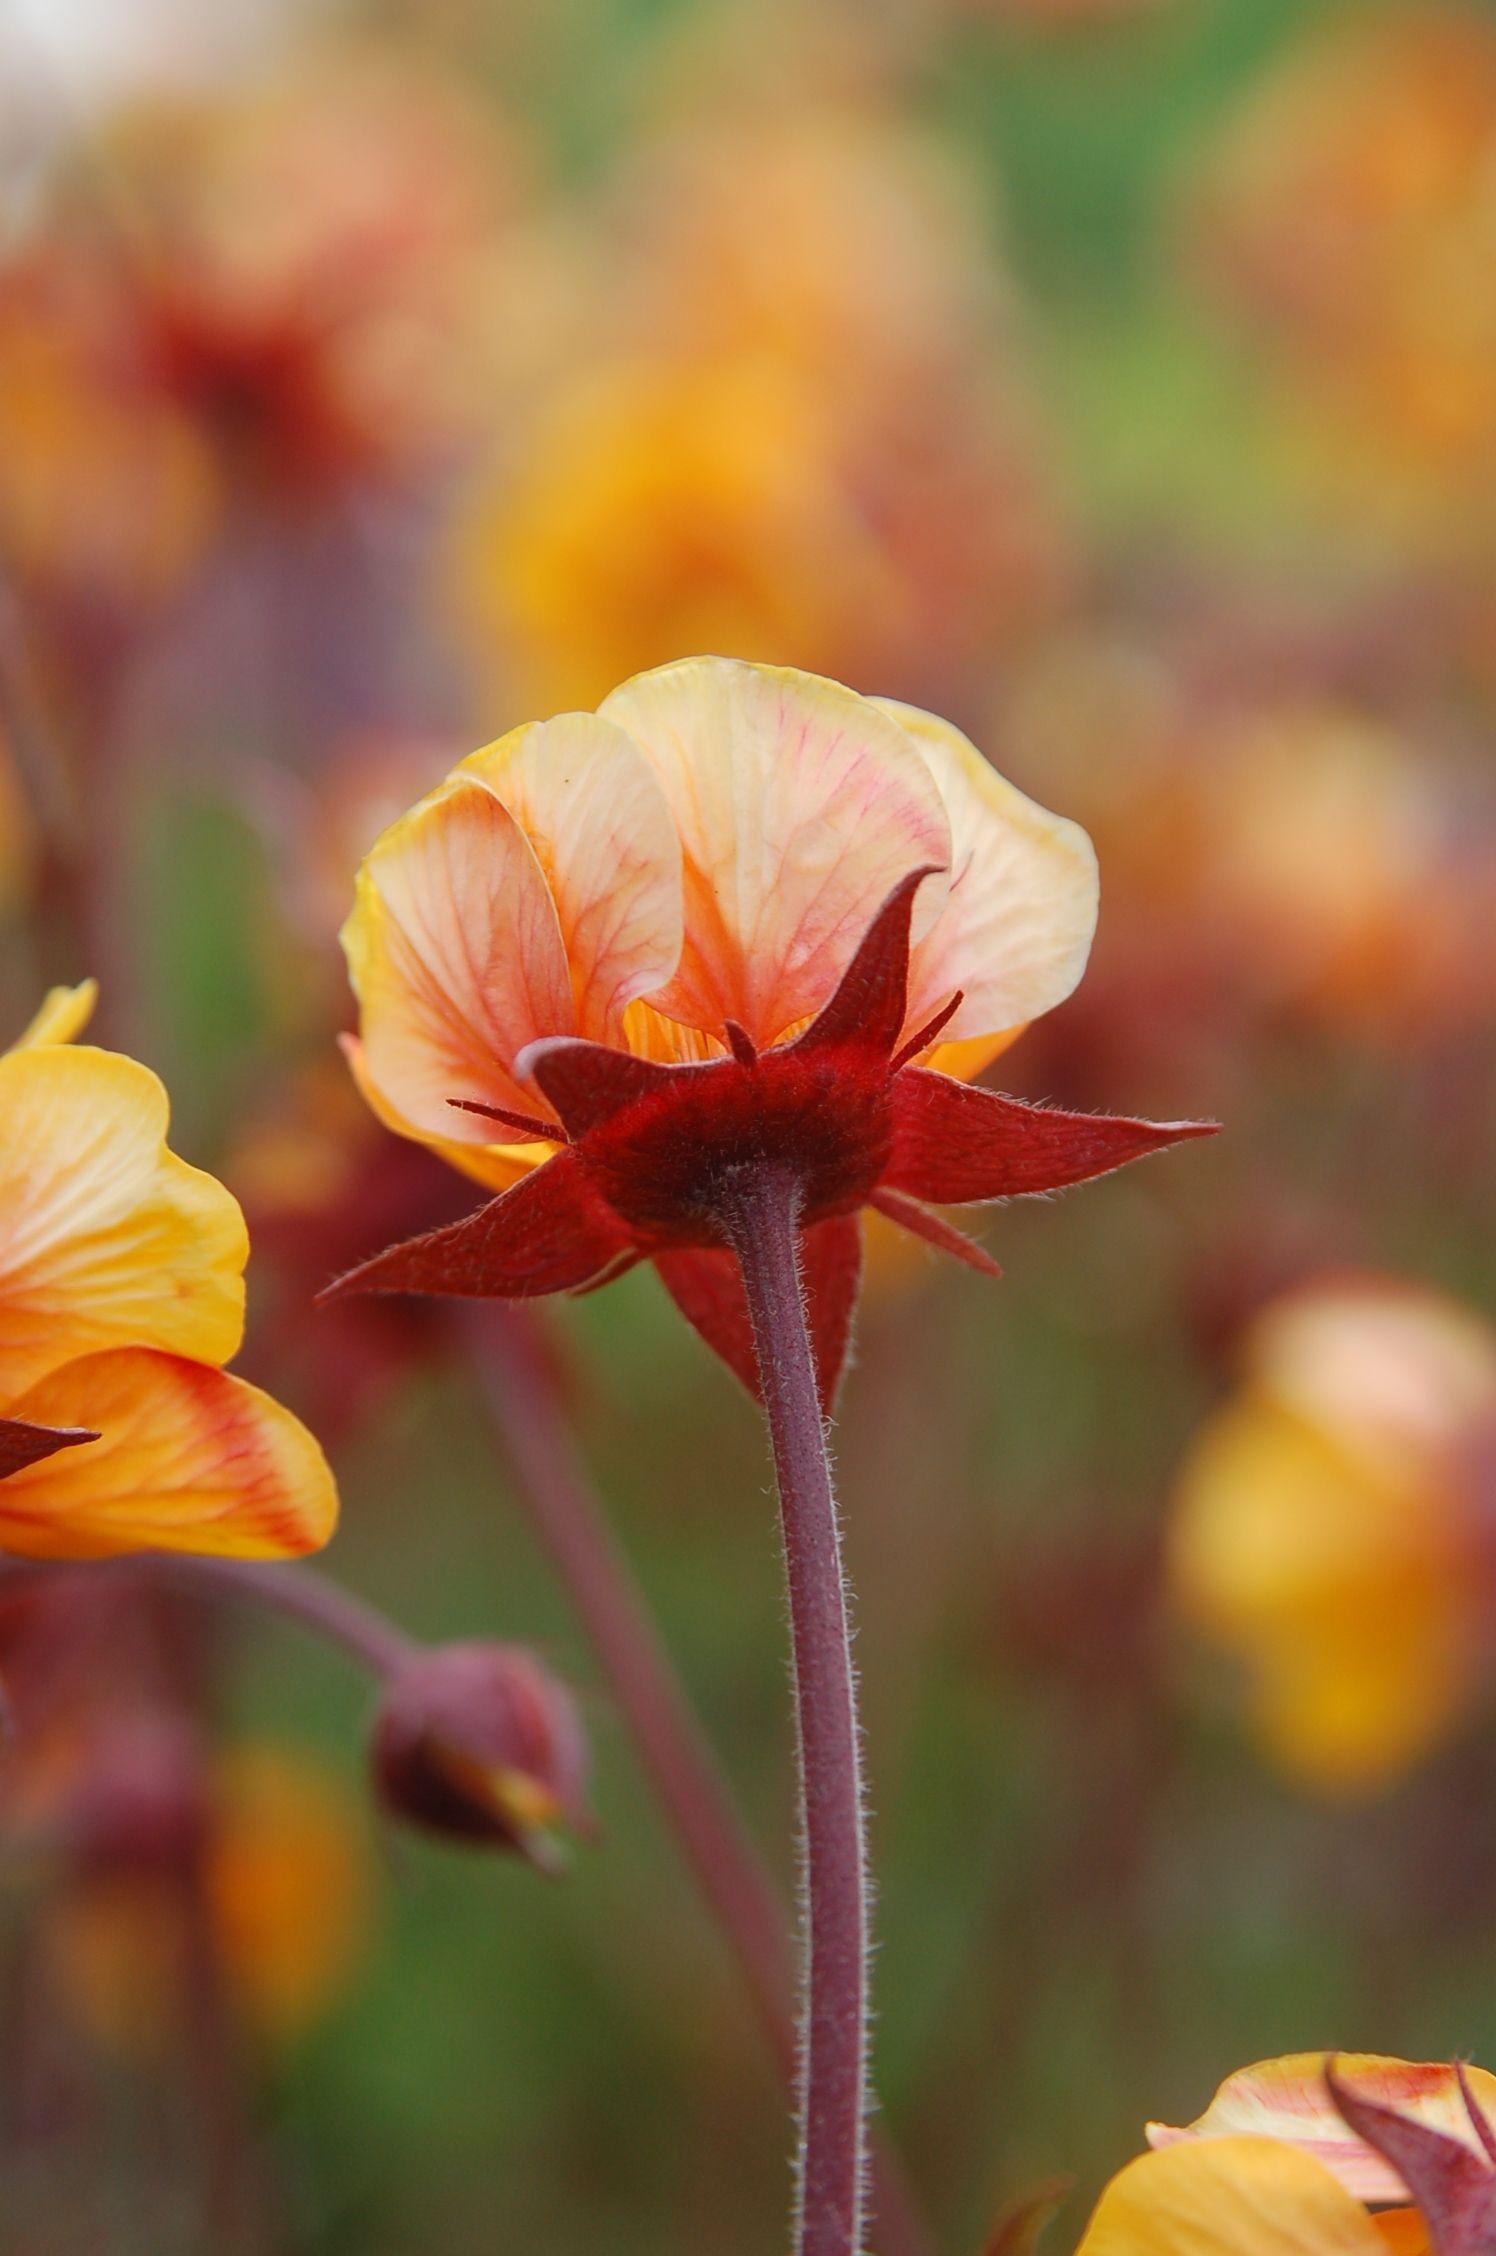 Geum Spanish Fly Fiori flowers blumen Pinterest